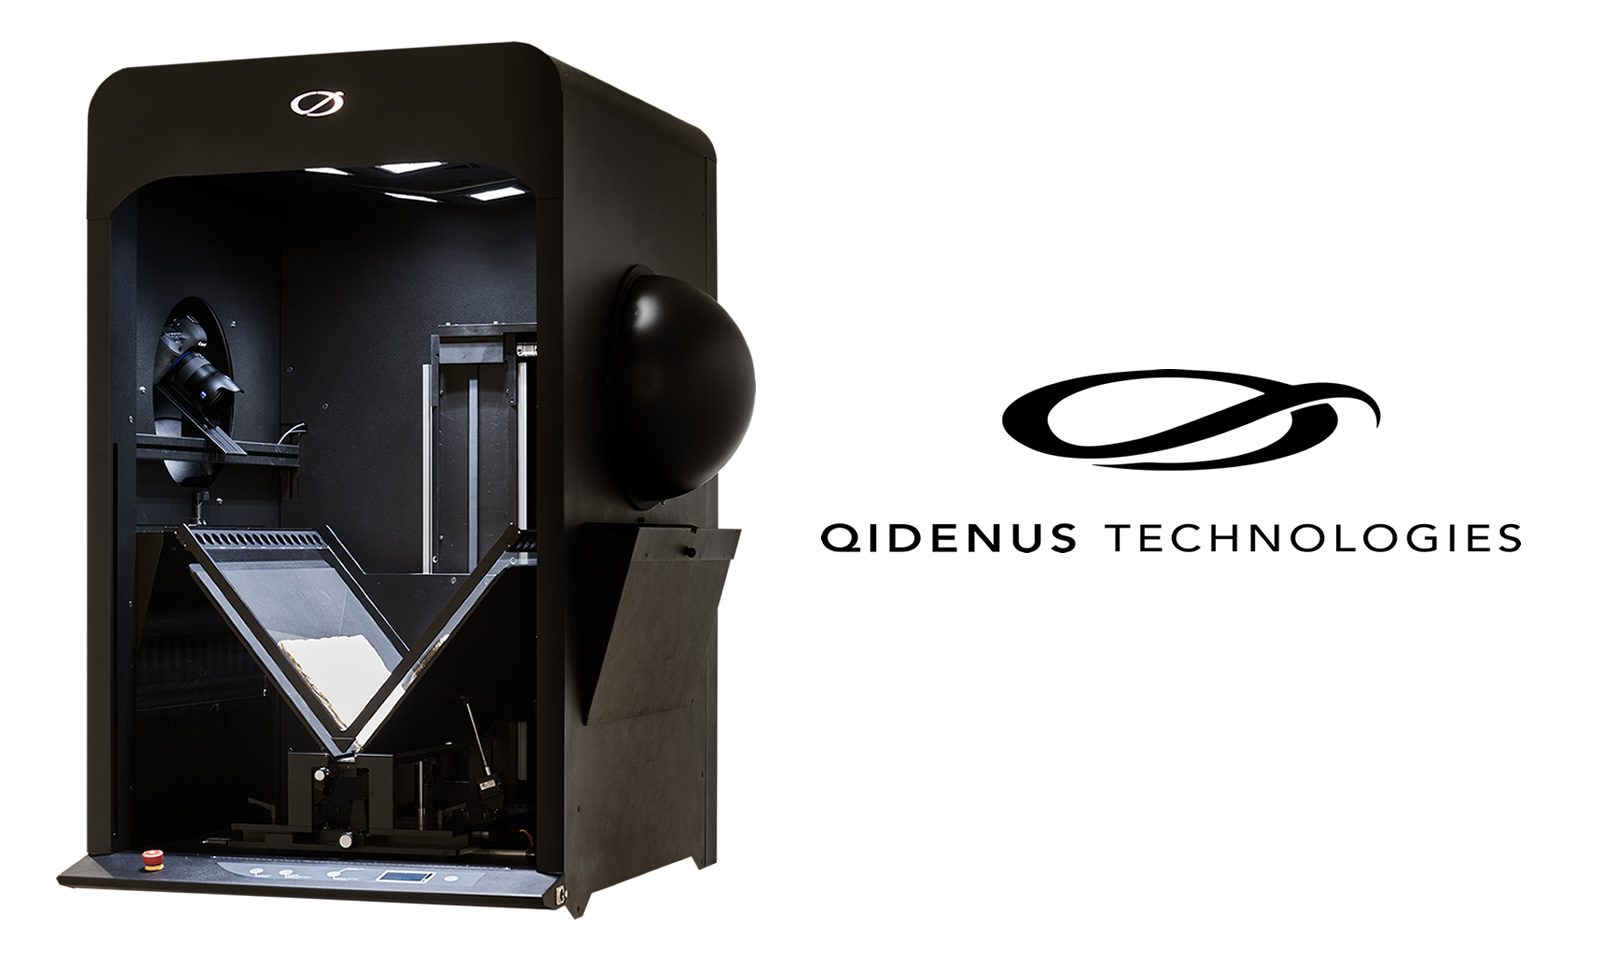 iGuana - Qidenus Mastered Book Scanner (Powered by iGuana)